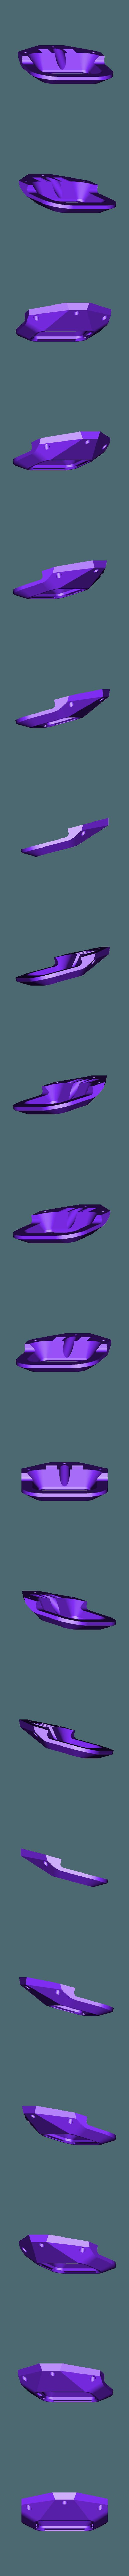 Dual_E3D_Mount_v4-5_DUCT.STL Download free STL file Jellyfish Mount (RigidBot Dual E3Dv6) • 3D printer object, WalterHsiao